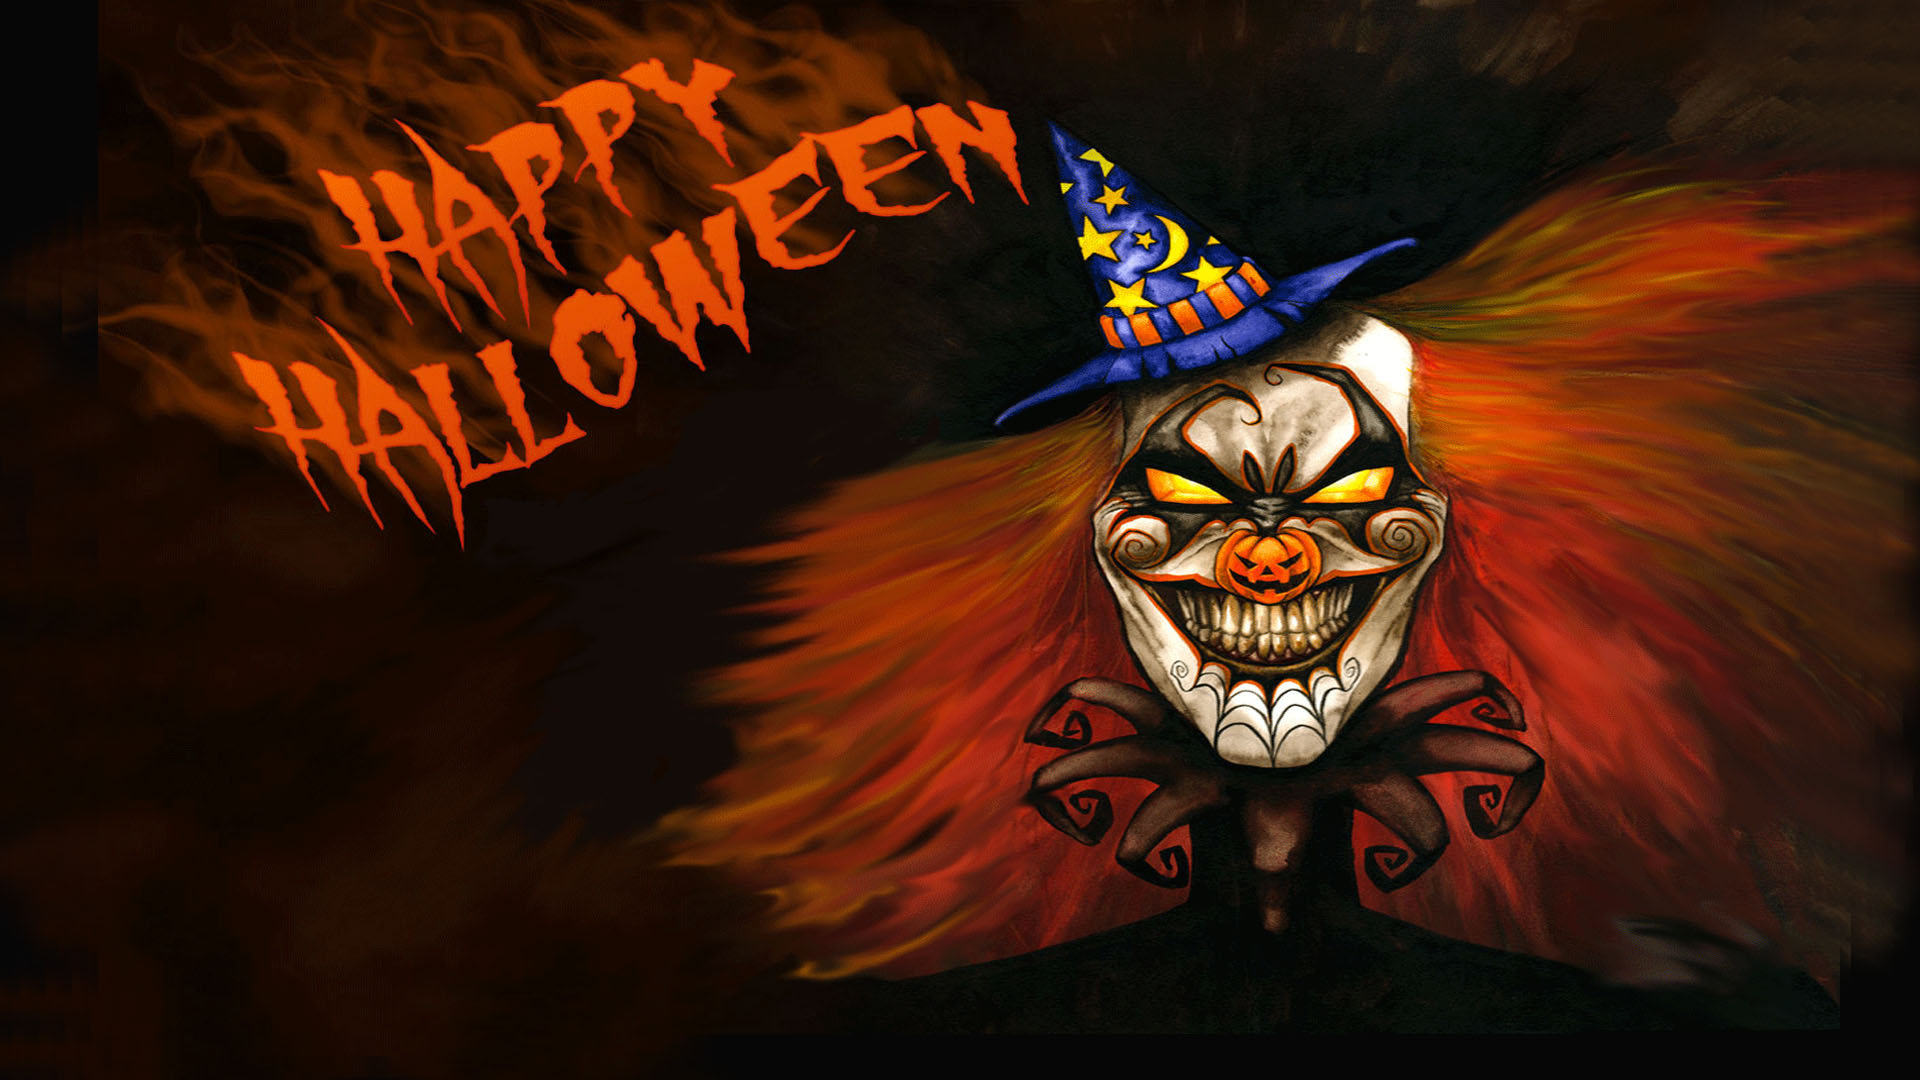 Download Wallpaper Halloween Spider - PYE1v5  HD_55312.jpg